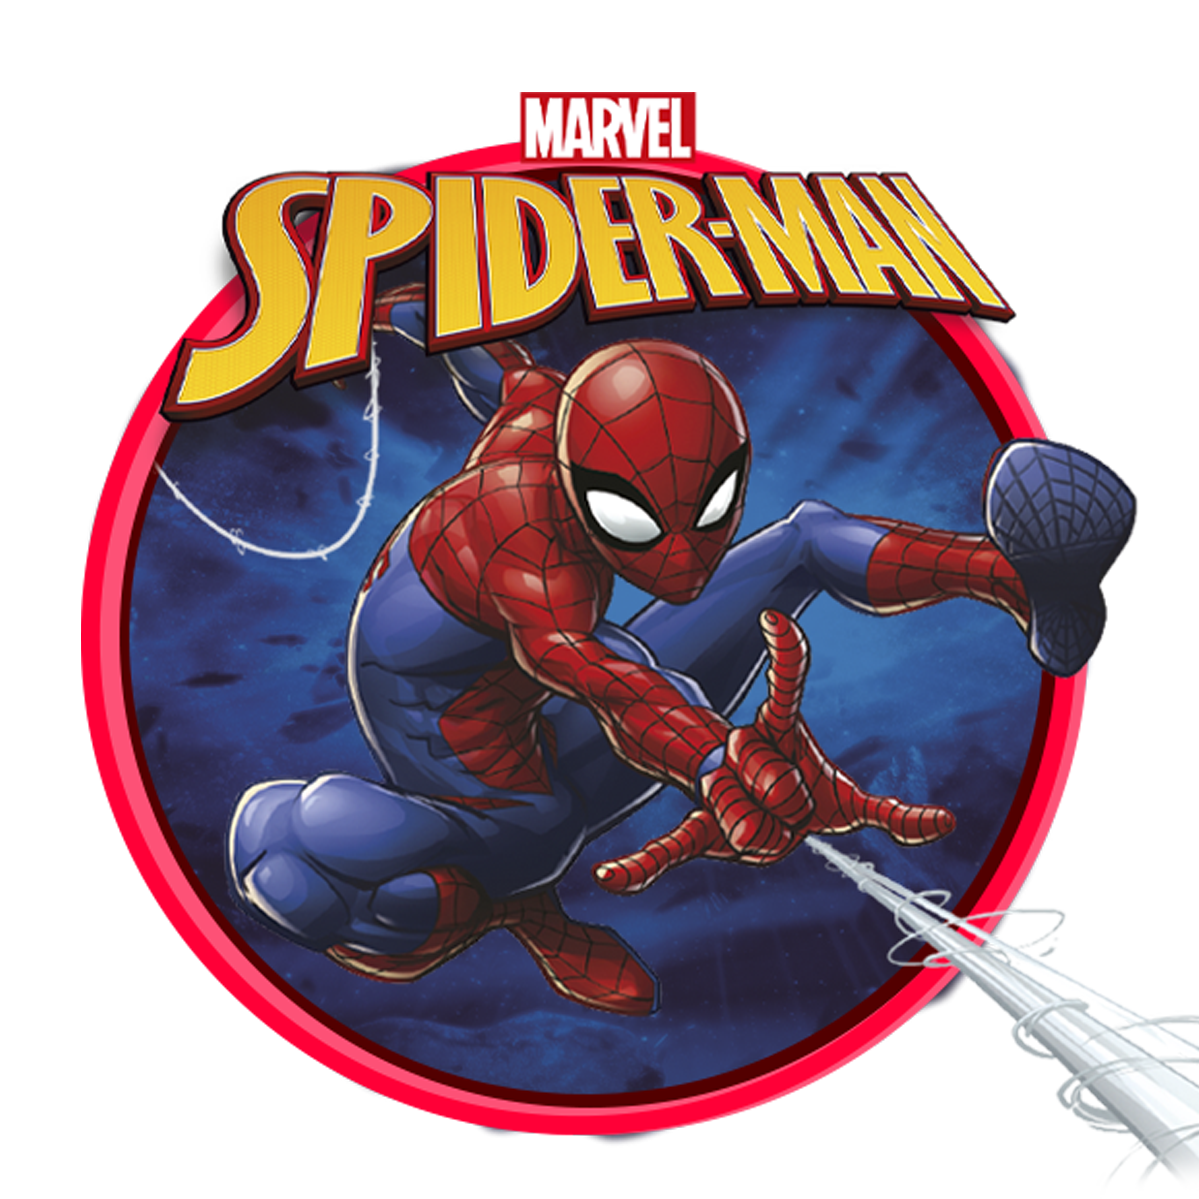 Set de Boxeo Spiderman